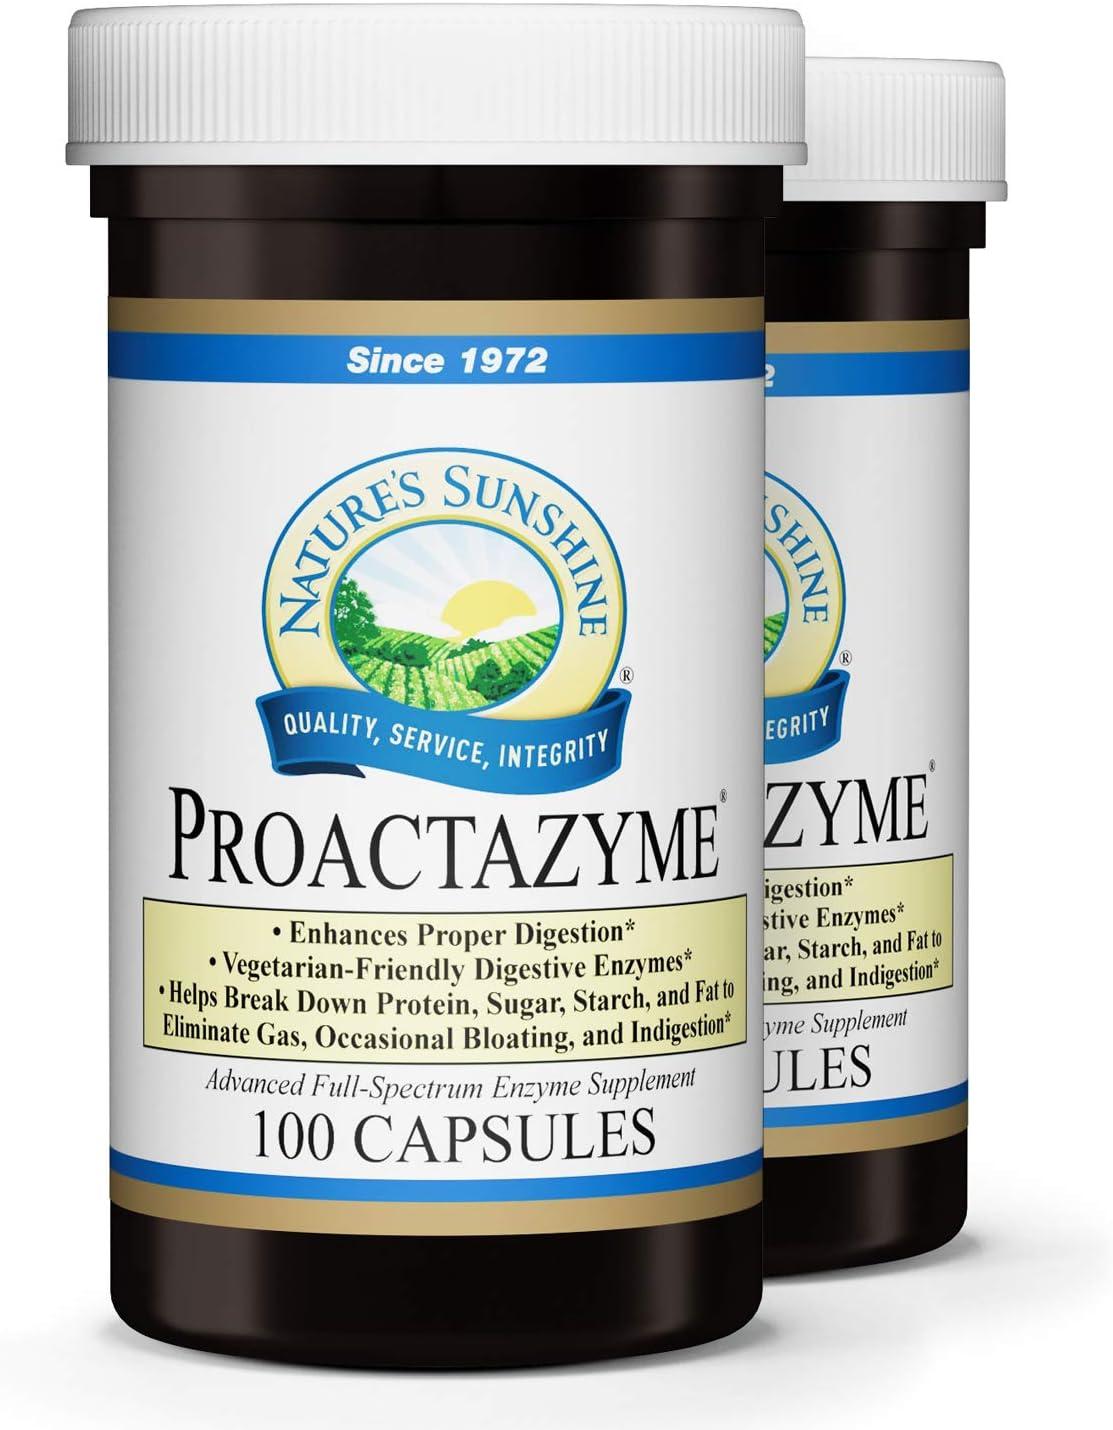 Nature's Sunshine Proactazyme 100 Capsules, 2 Pack